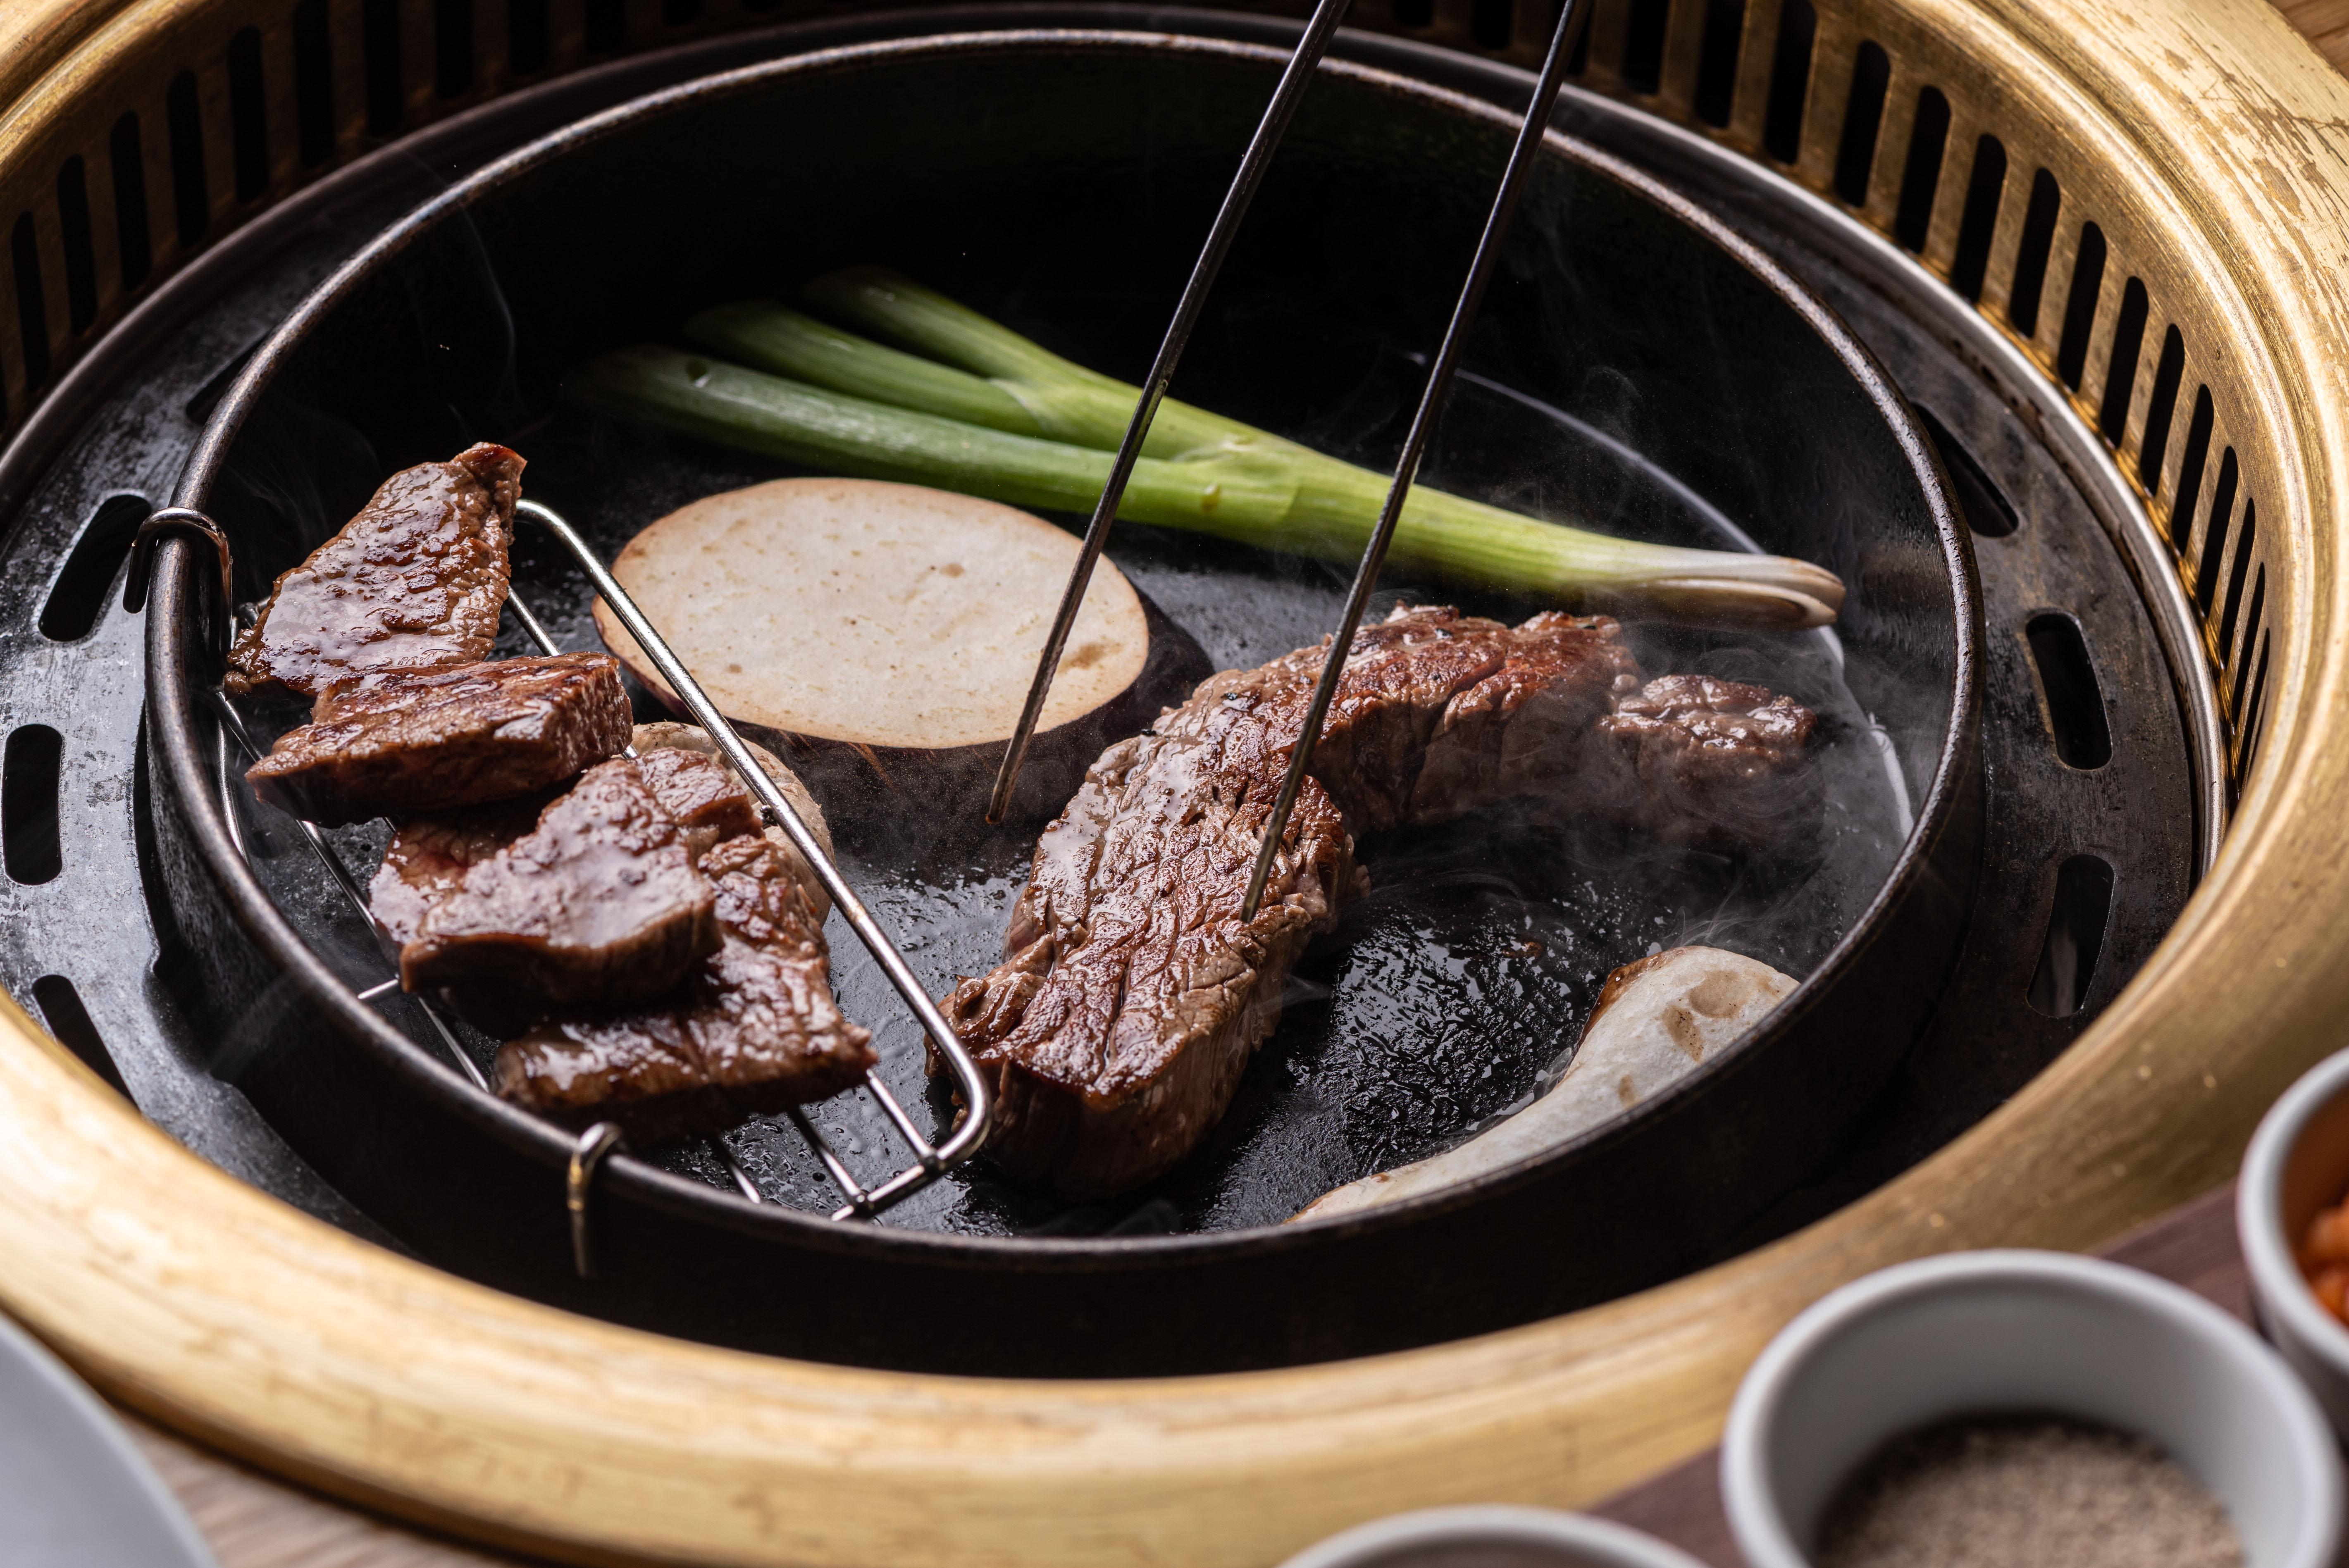 Grilling ribeye at Daedo Sikdang in LA's Koreatown.